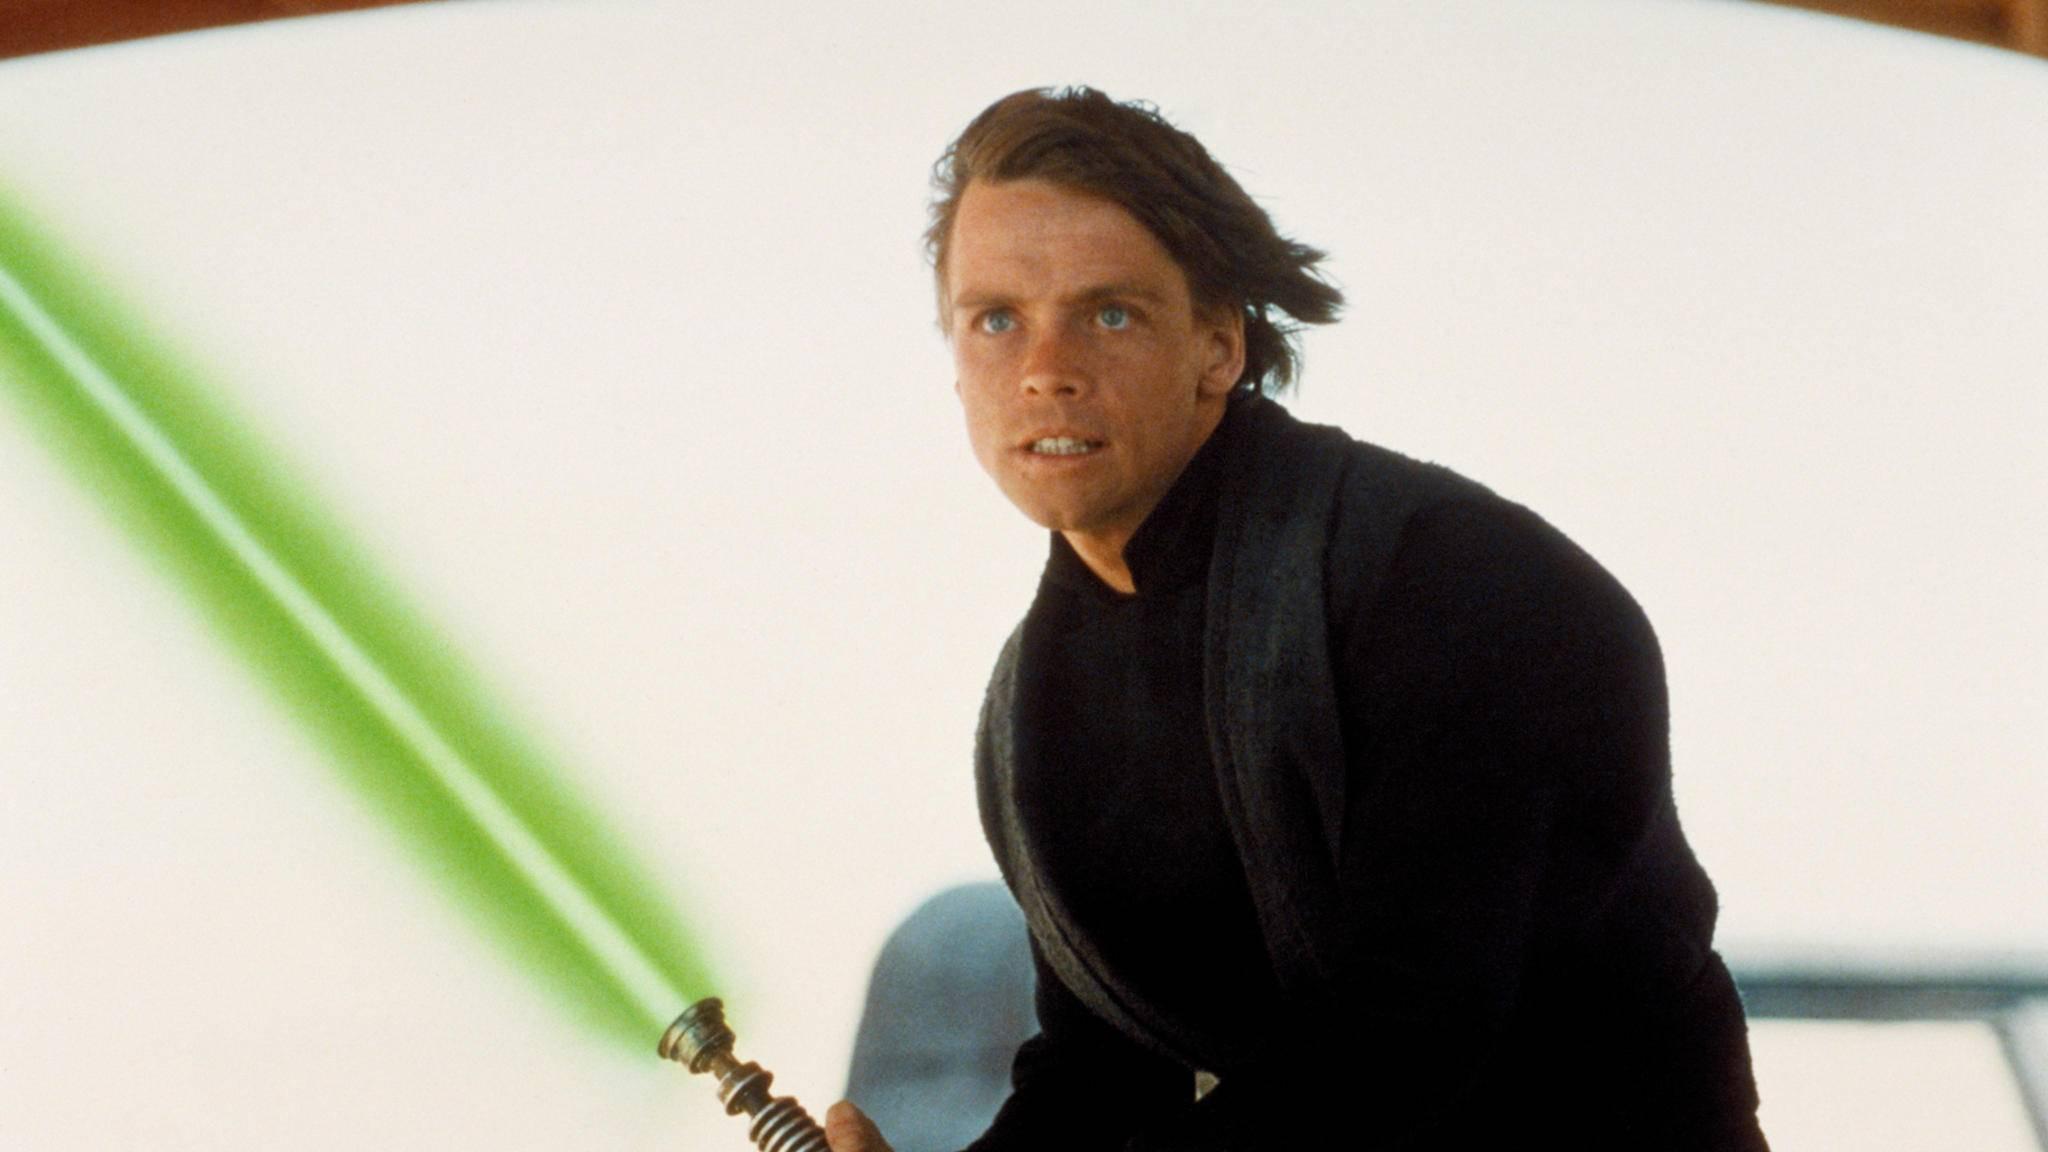 star wars luke skywalker mark hamill